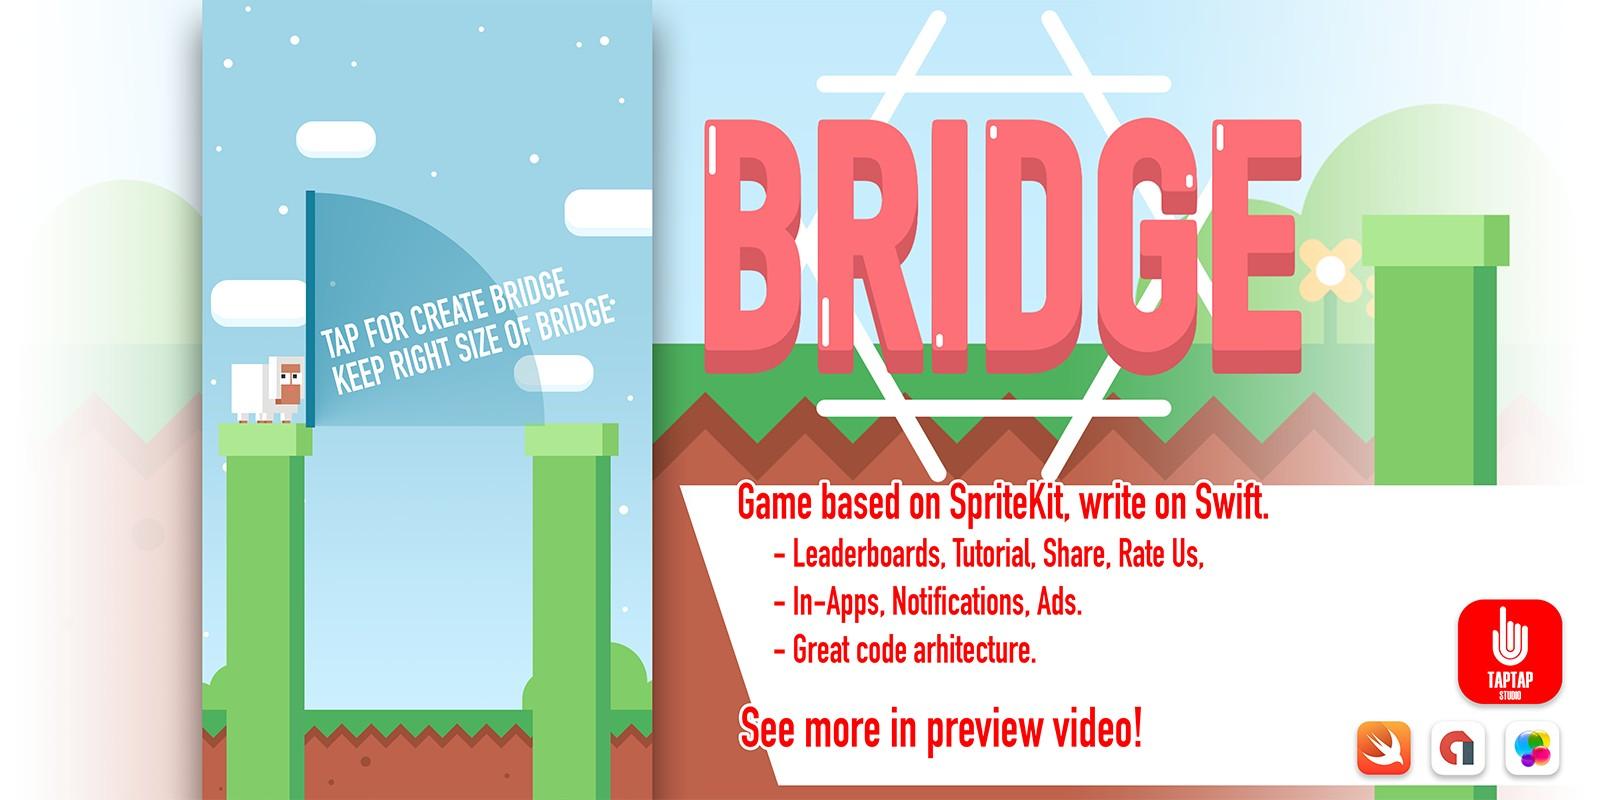 Bridge - iOS Source Code